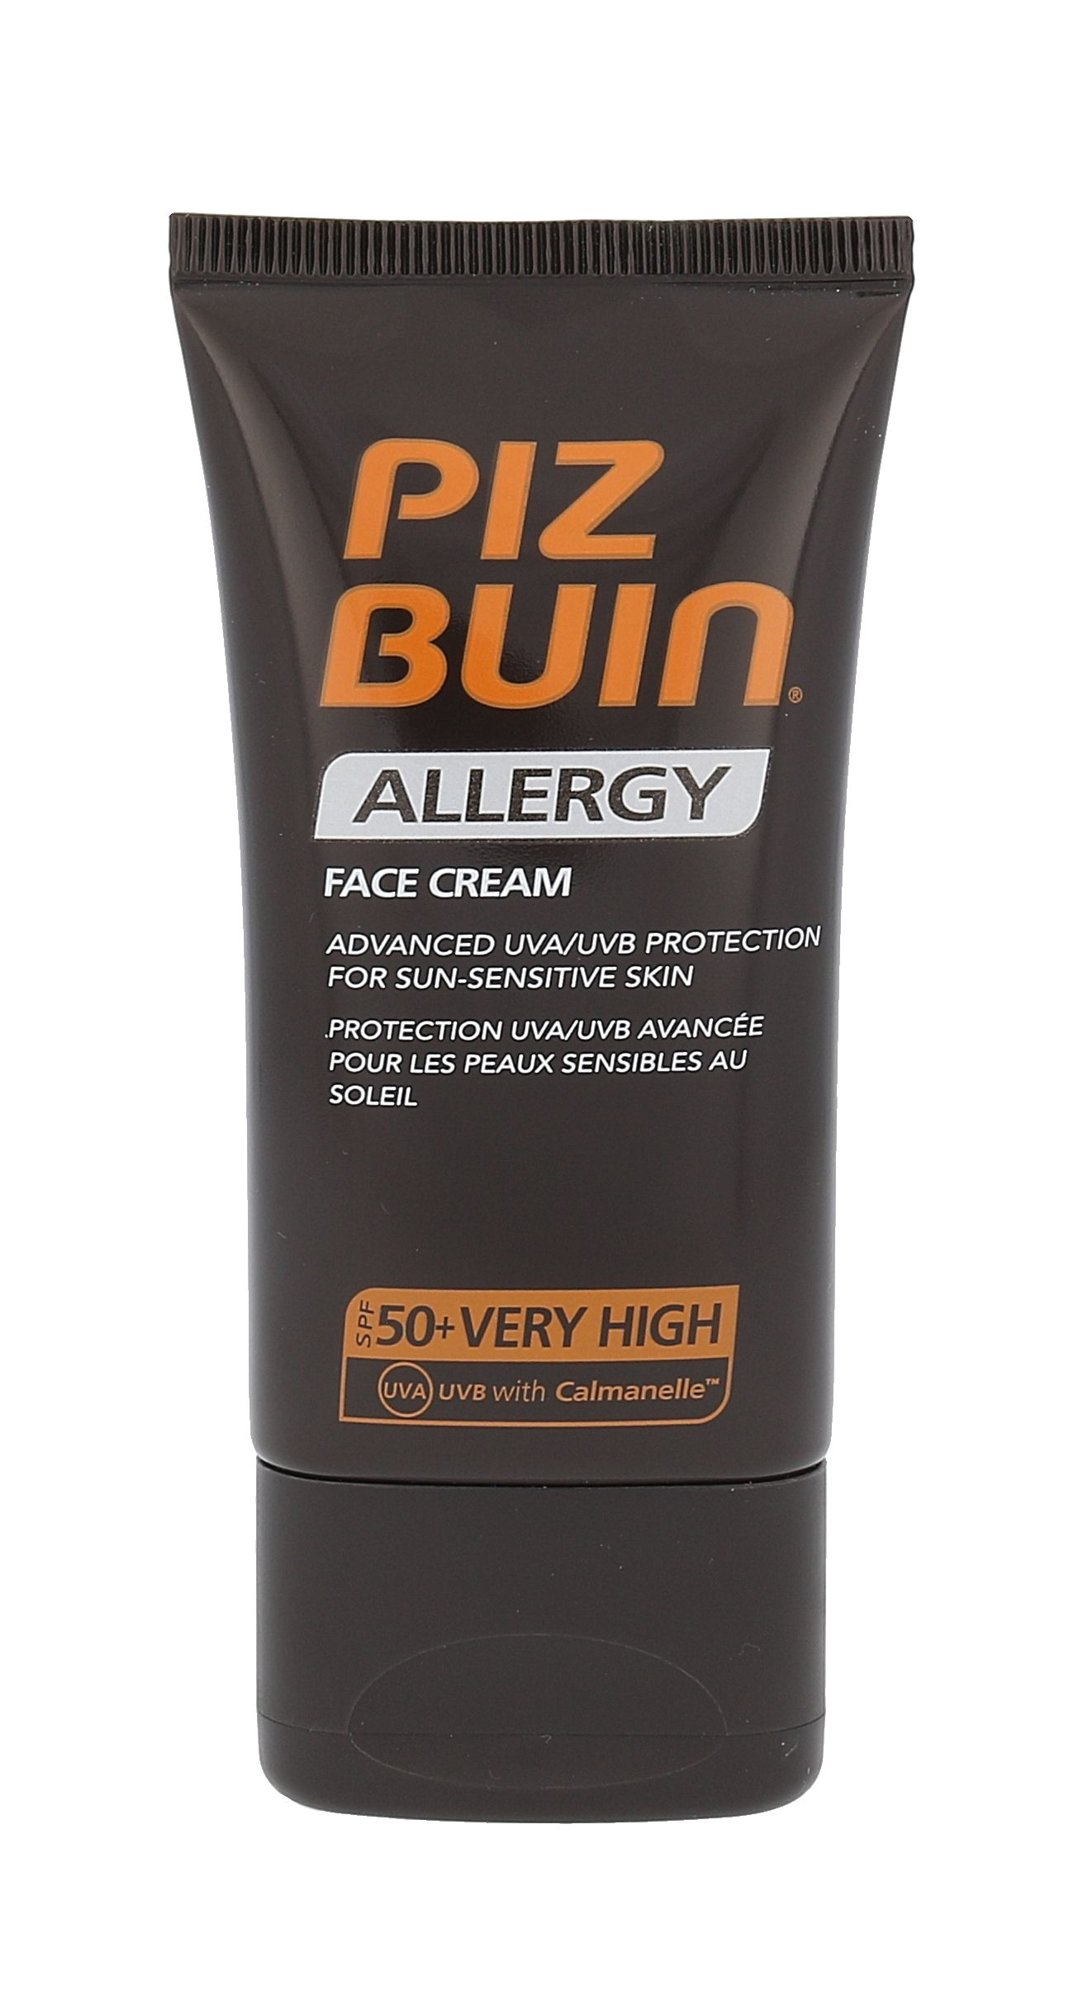 PIZ BUIN Allergy Cosmetic 40ml